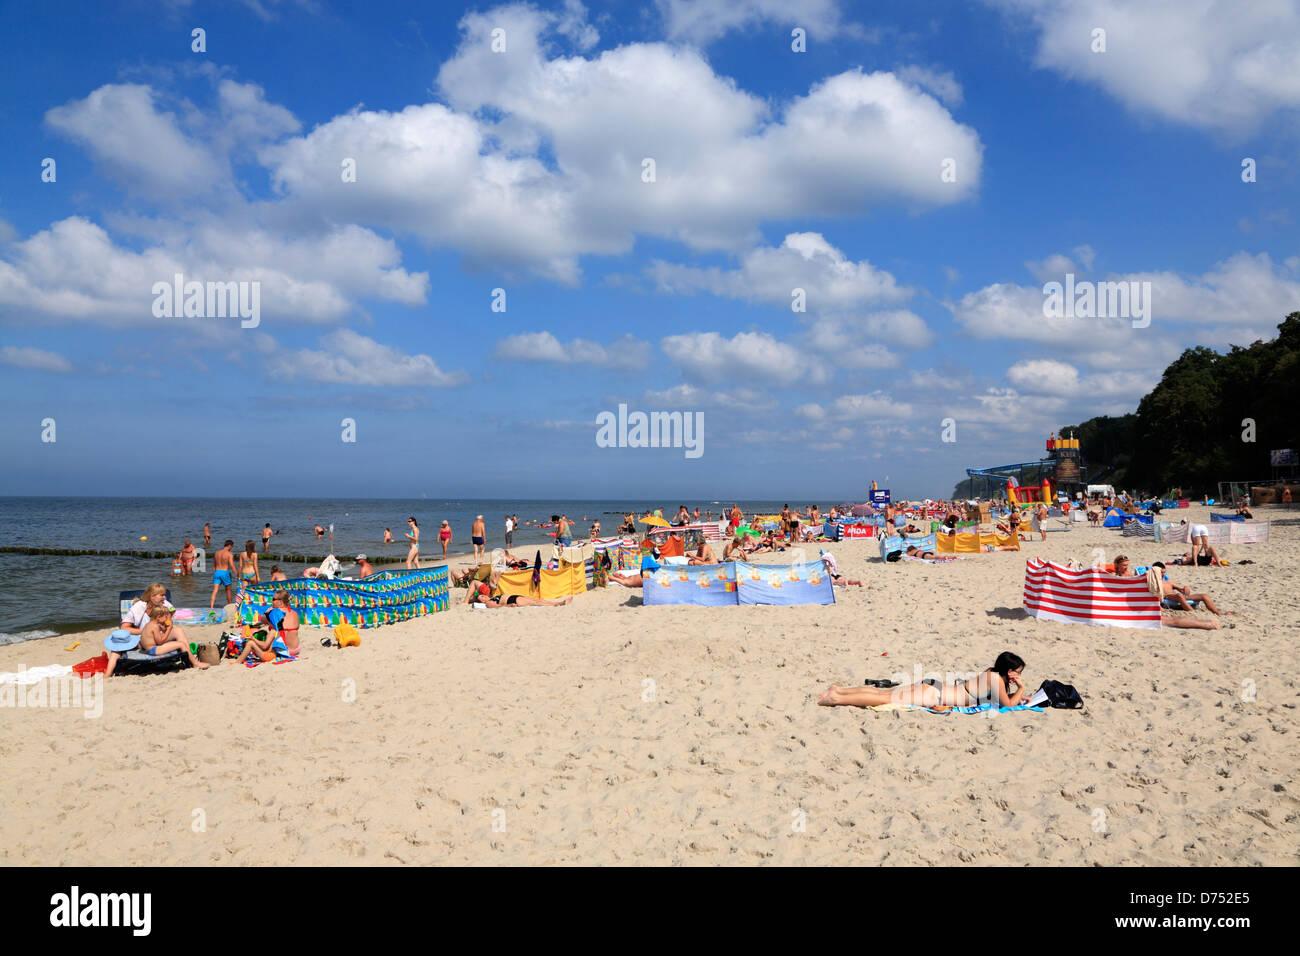 baltic sea stockfotos baltic sea bilder alamy. Black Bedroom Furniture Sets. Home Design Ideas